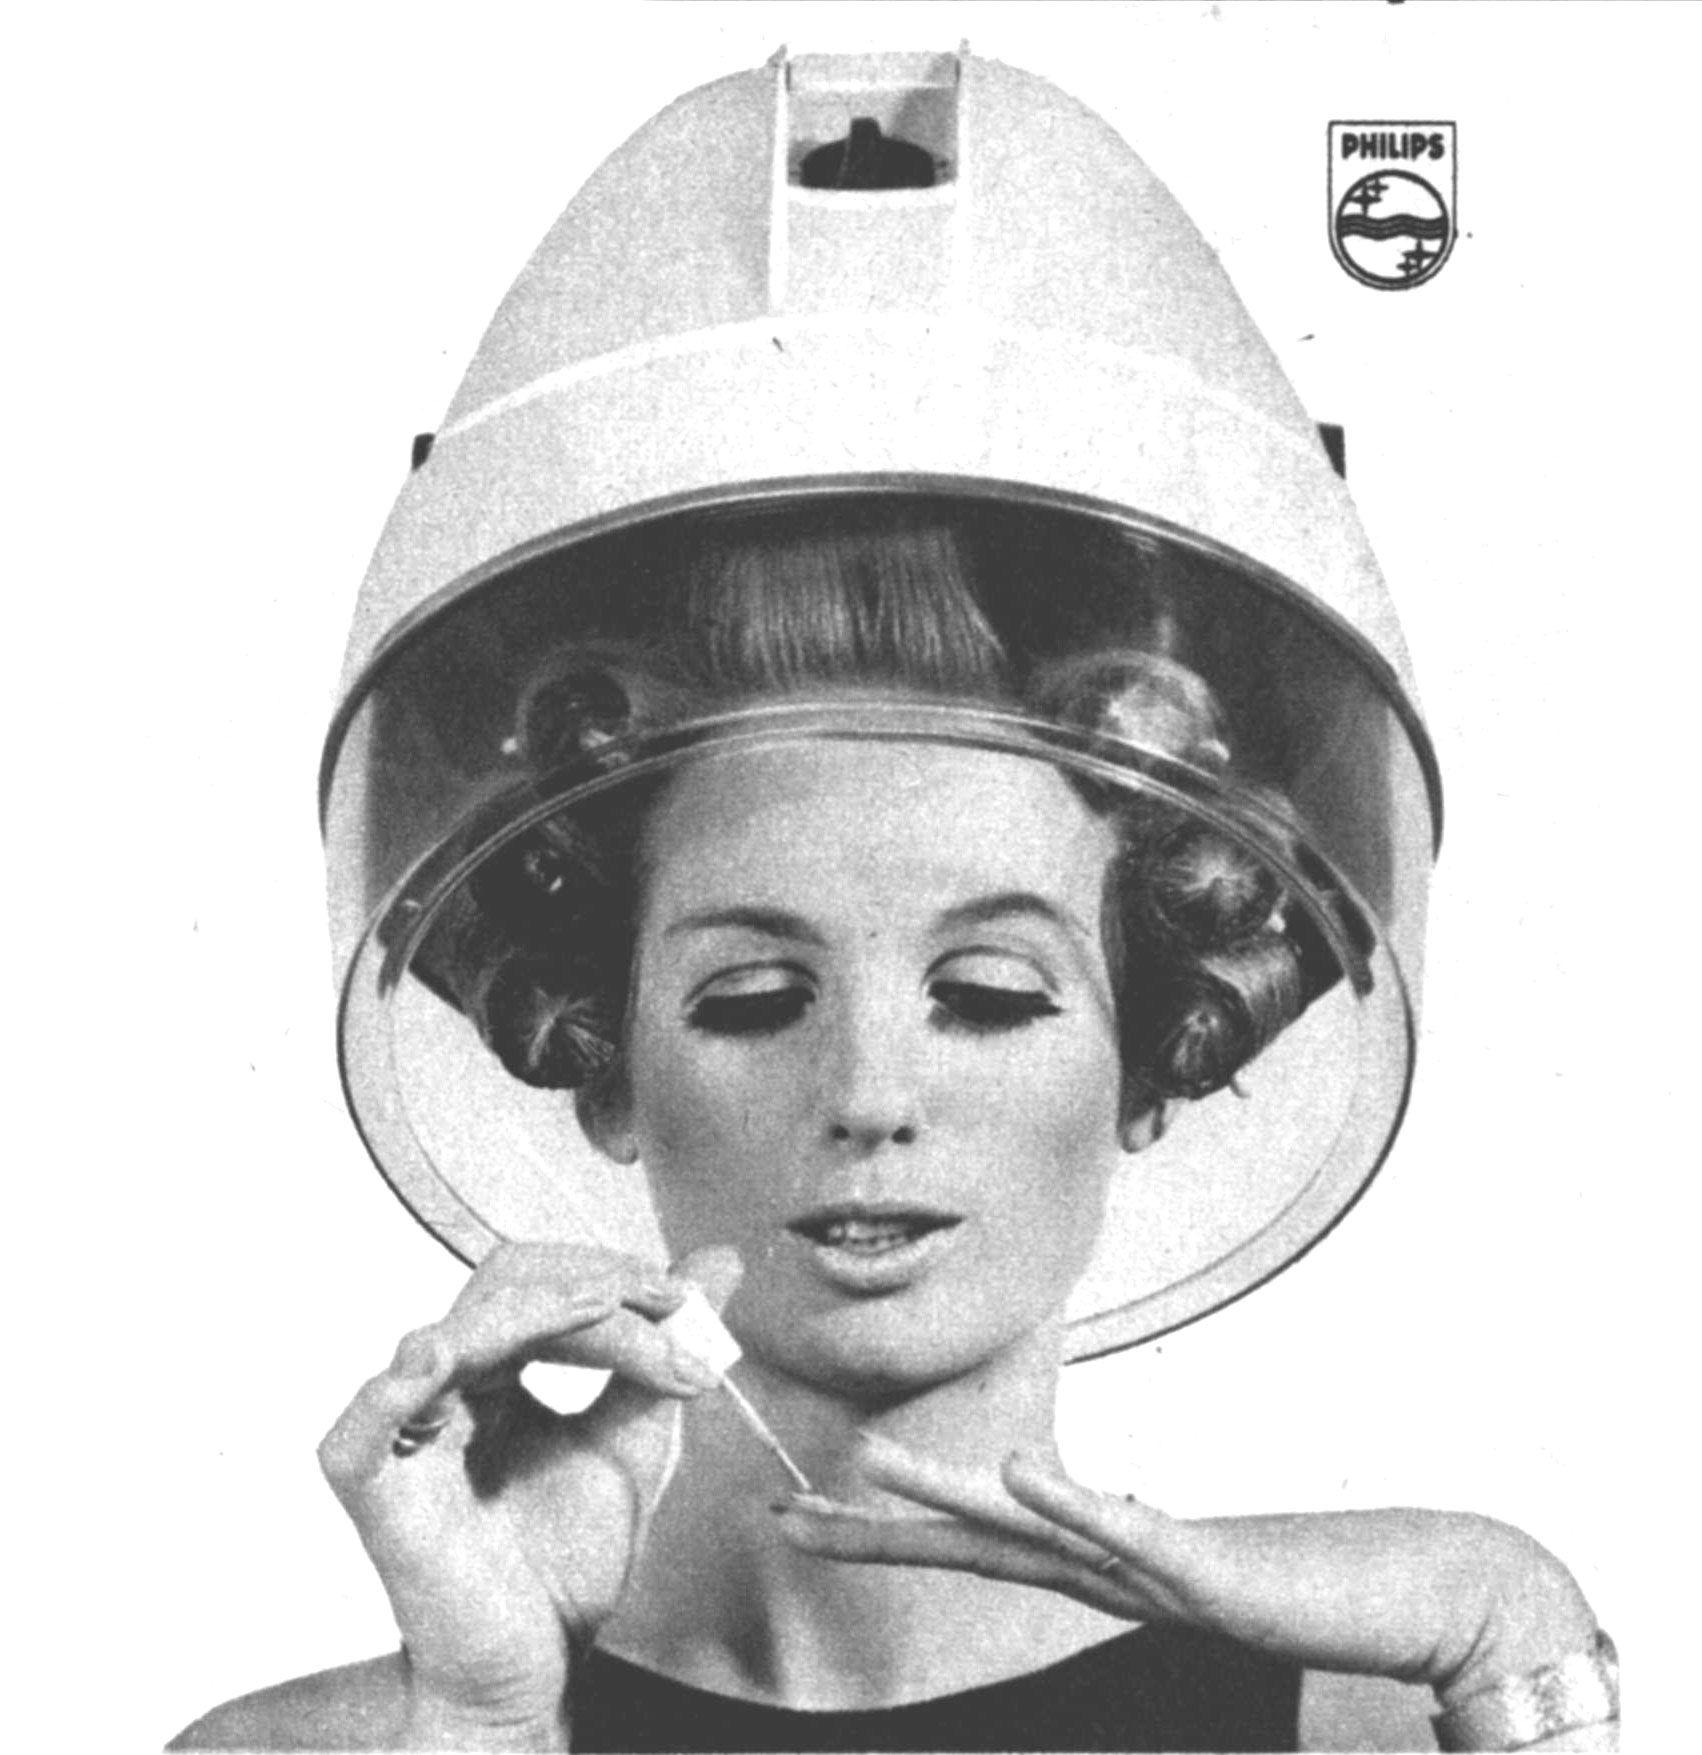 Pin by ladislav bleha on krása pinterest hair dryer dryer and